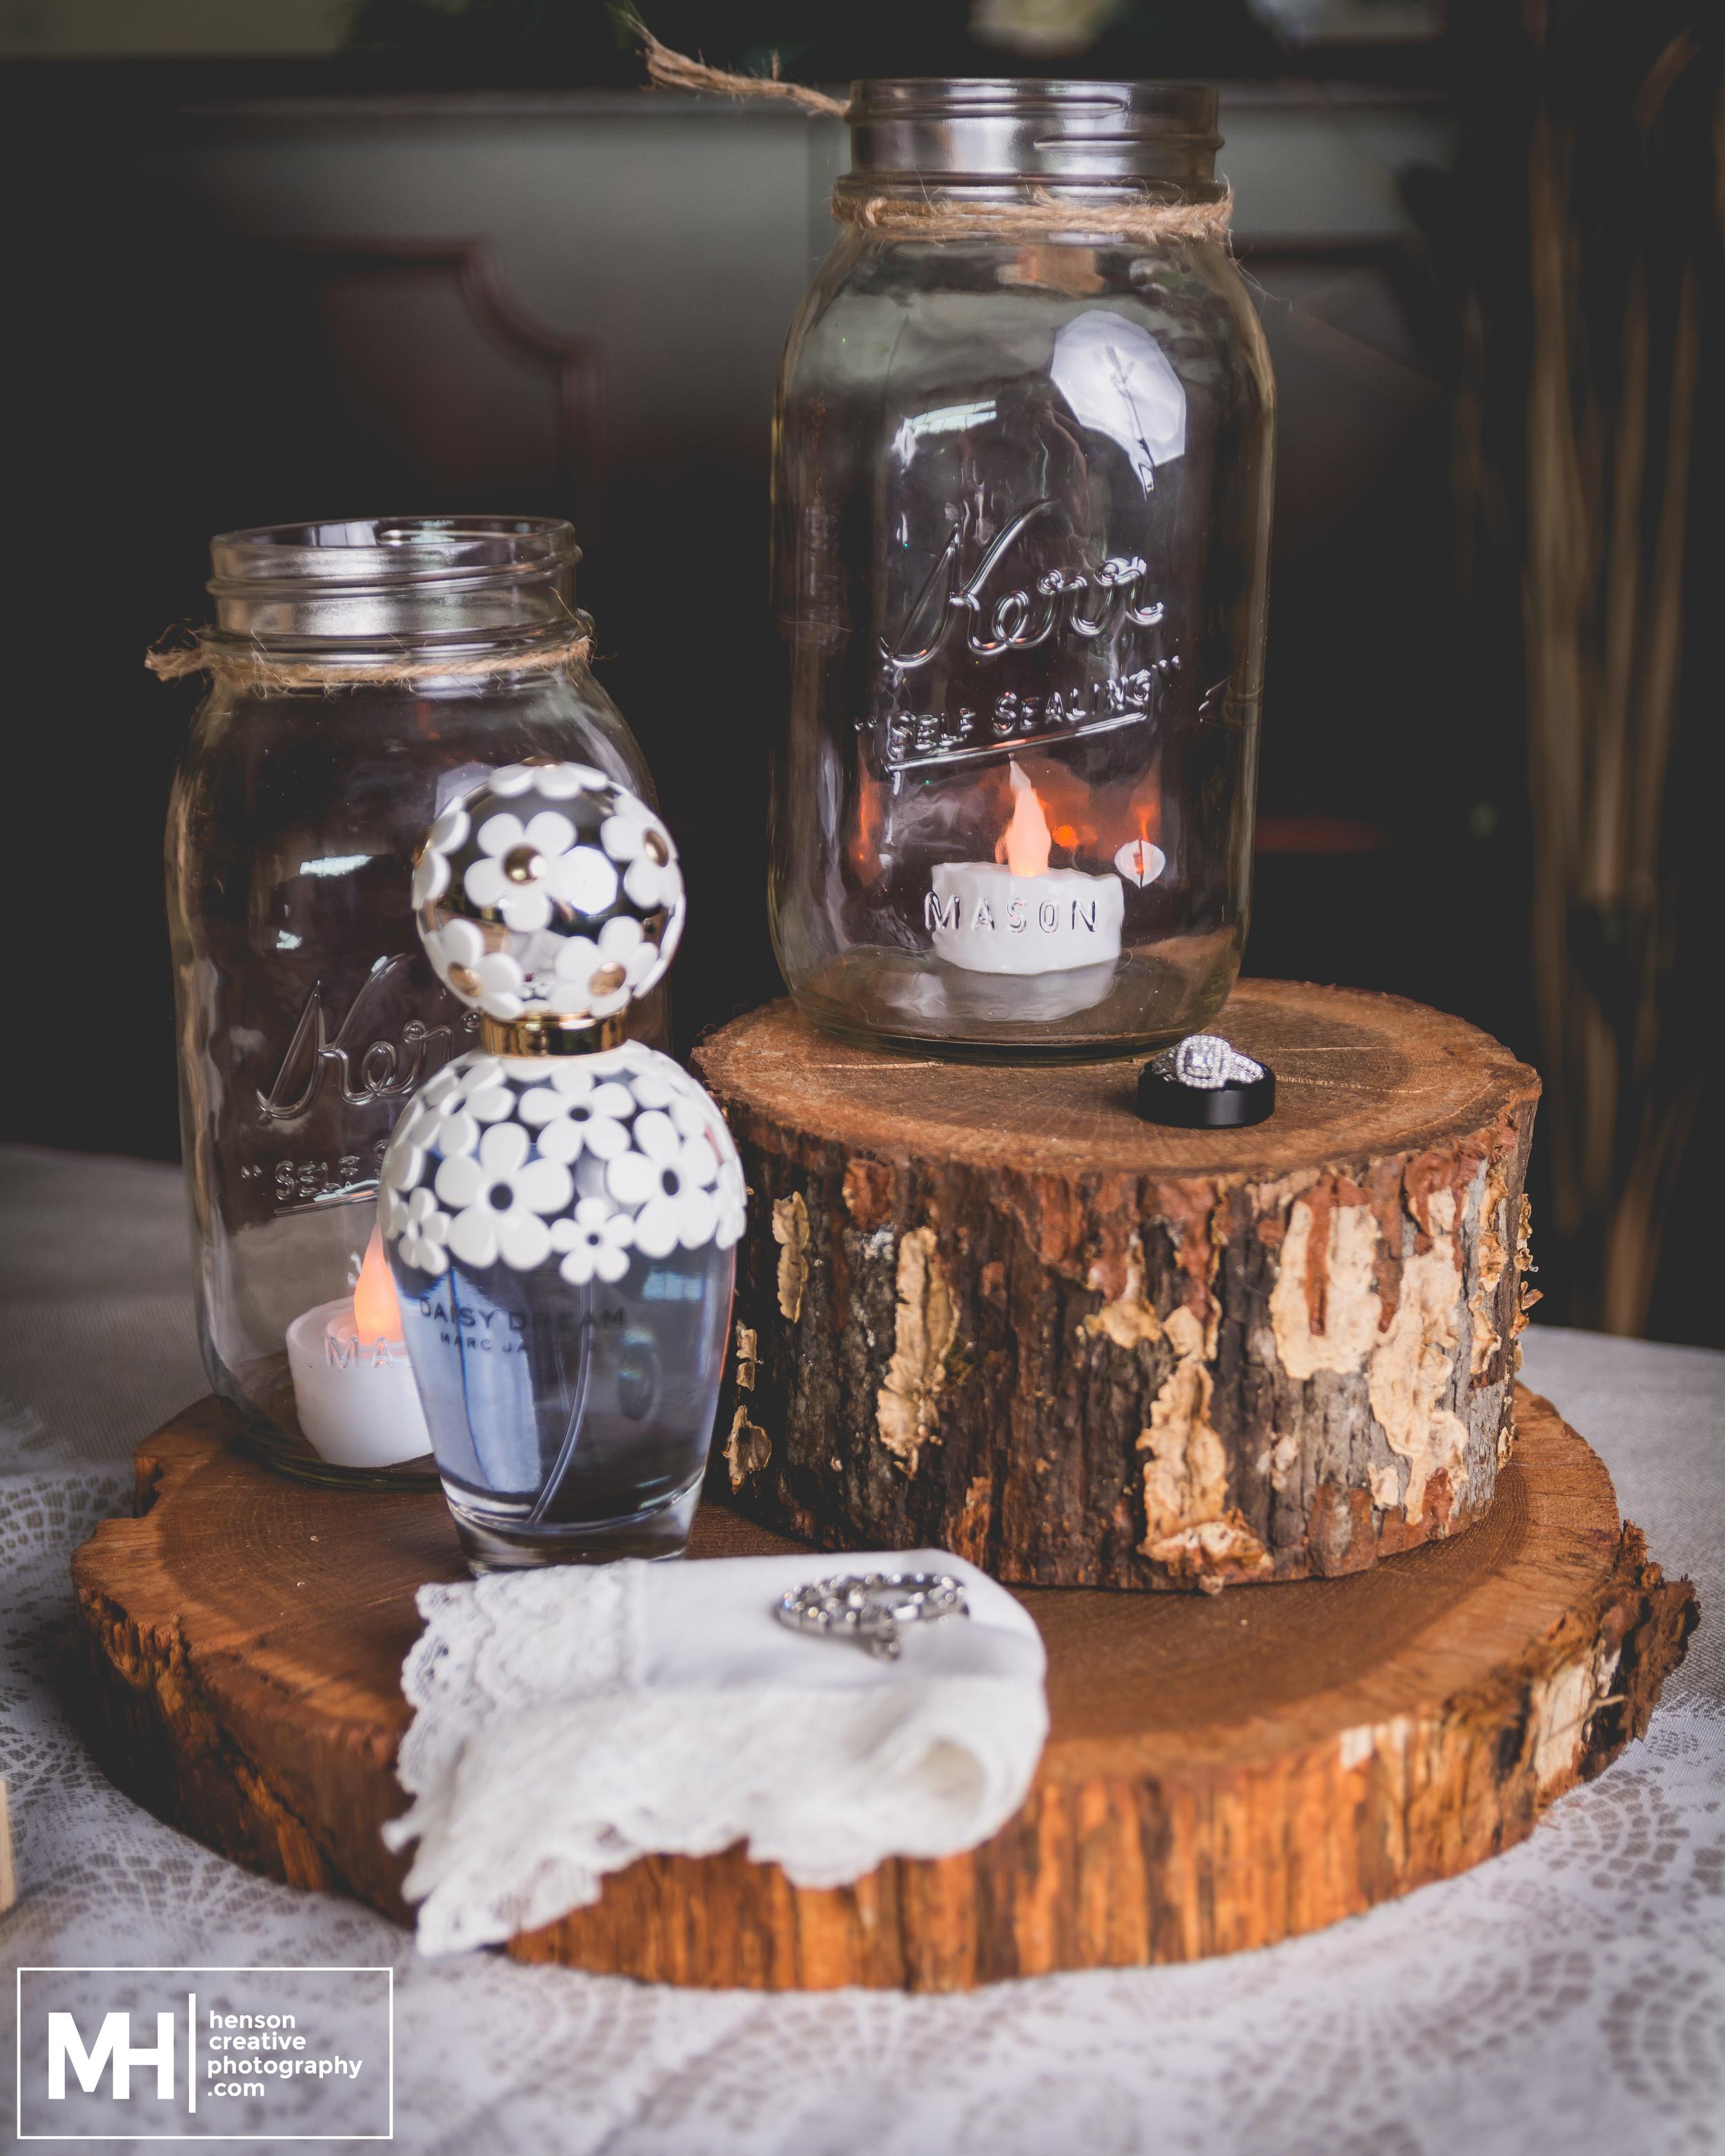 MooreWeddingWeb - Henson Creative - St. Louis Wedding Photographer-6.jpg